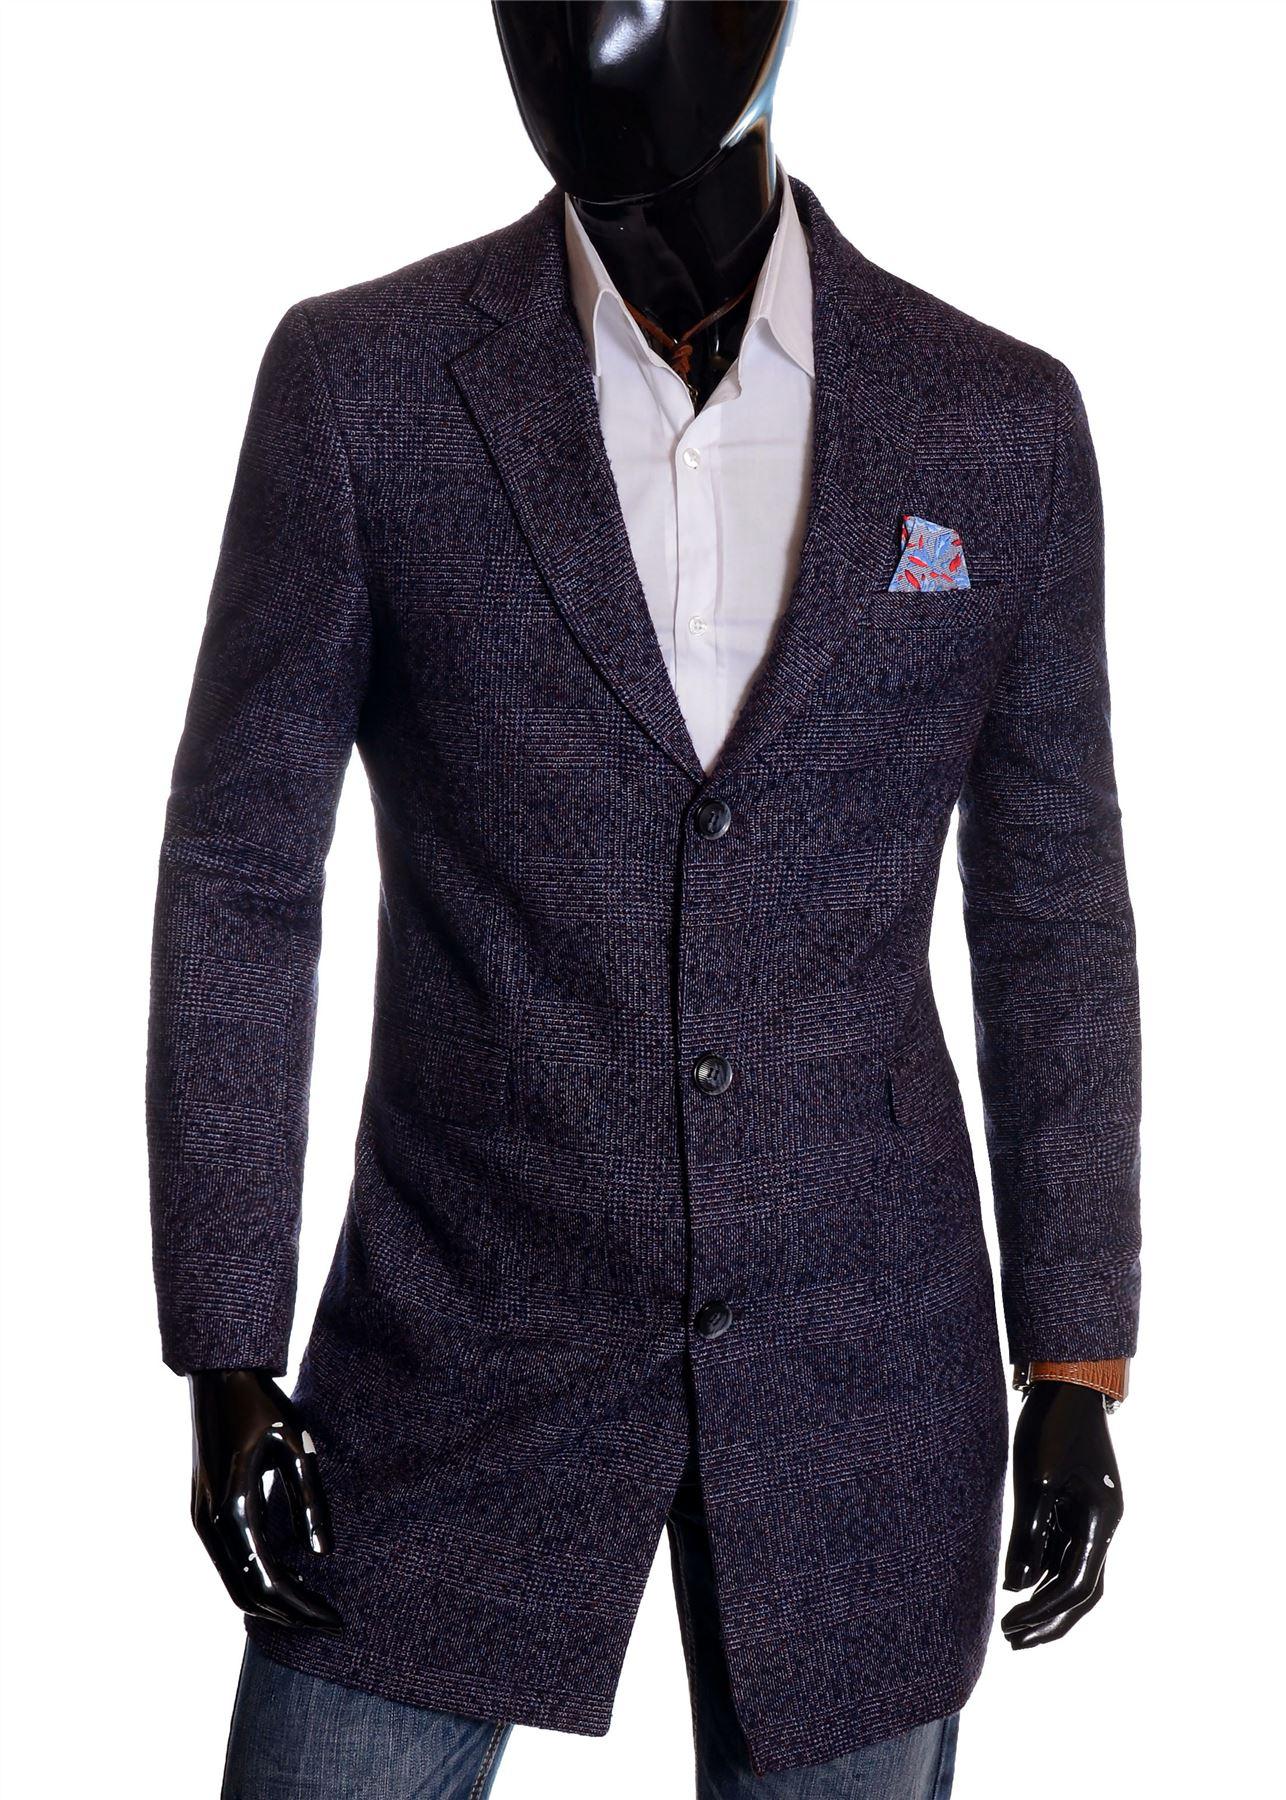 Men-039-s-Checkered-Coat-3-4-Long-Tweed-Cashmere-Wool-Trendy-Formal-Winter-Overcoat thumbnail 19